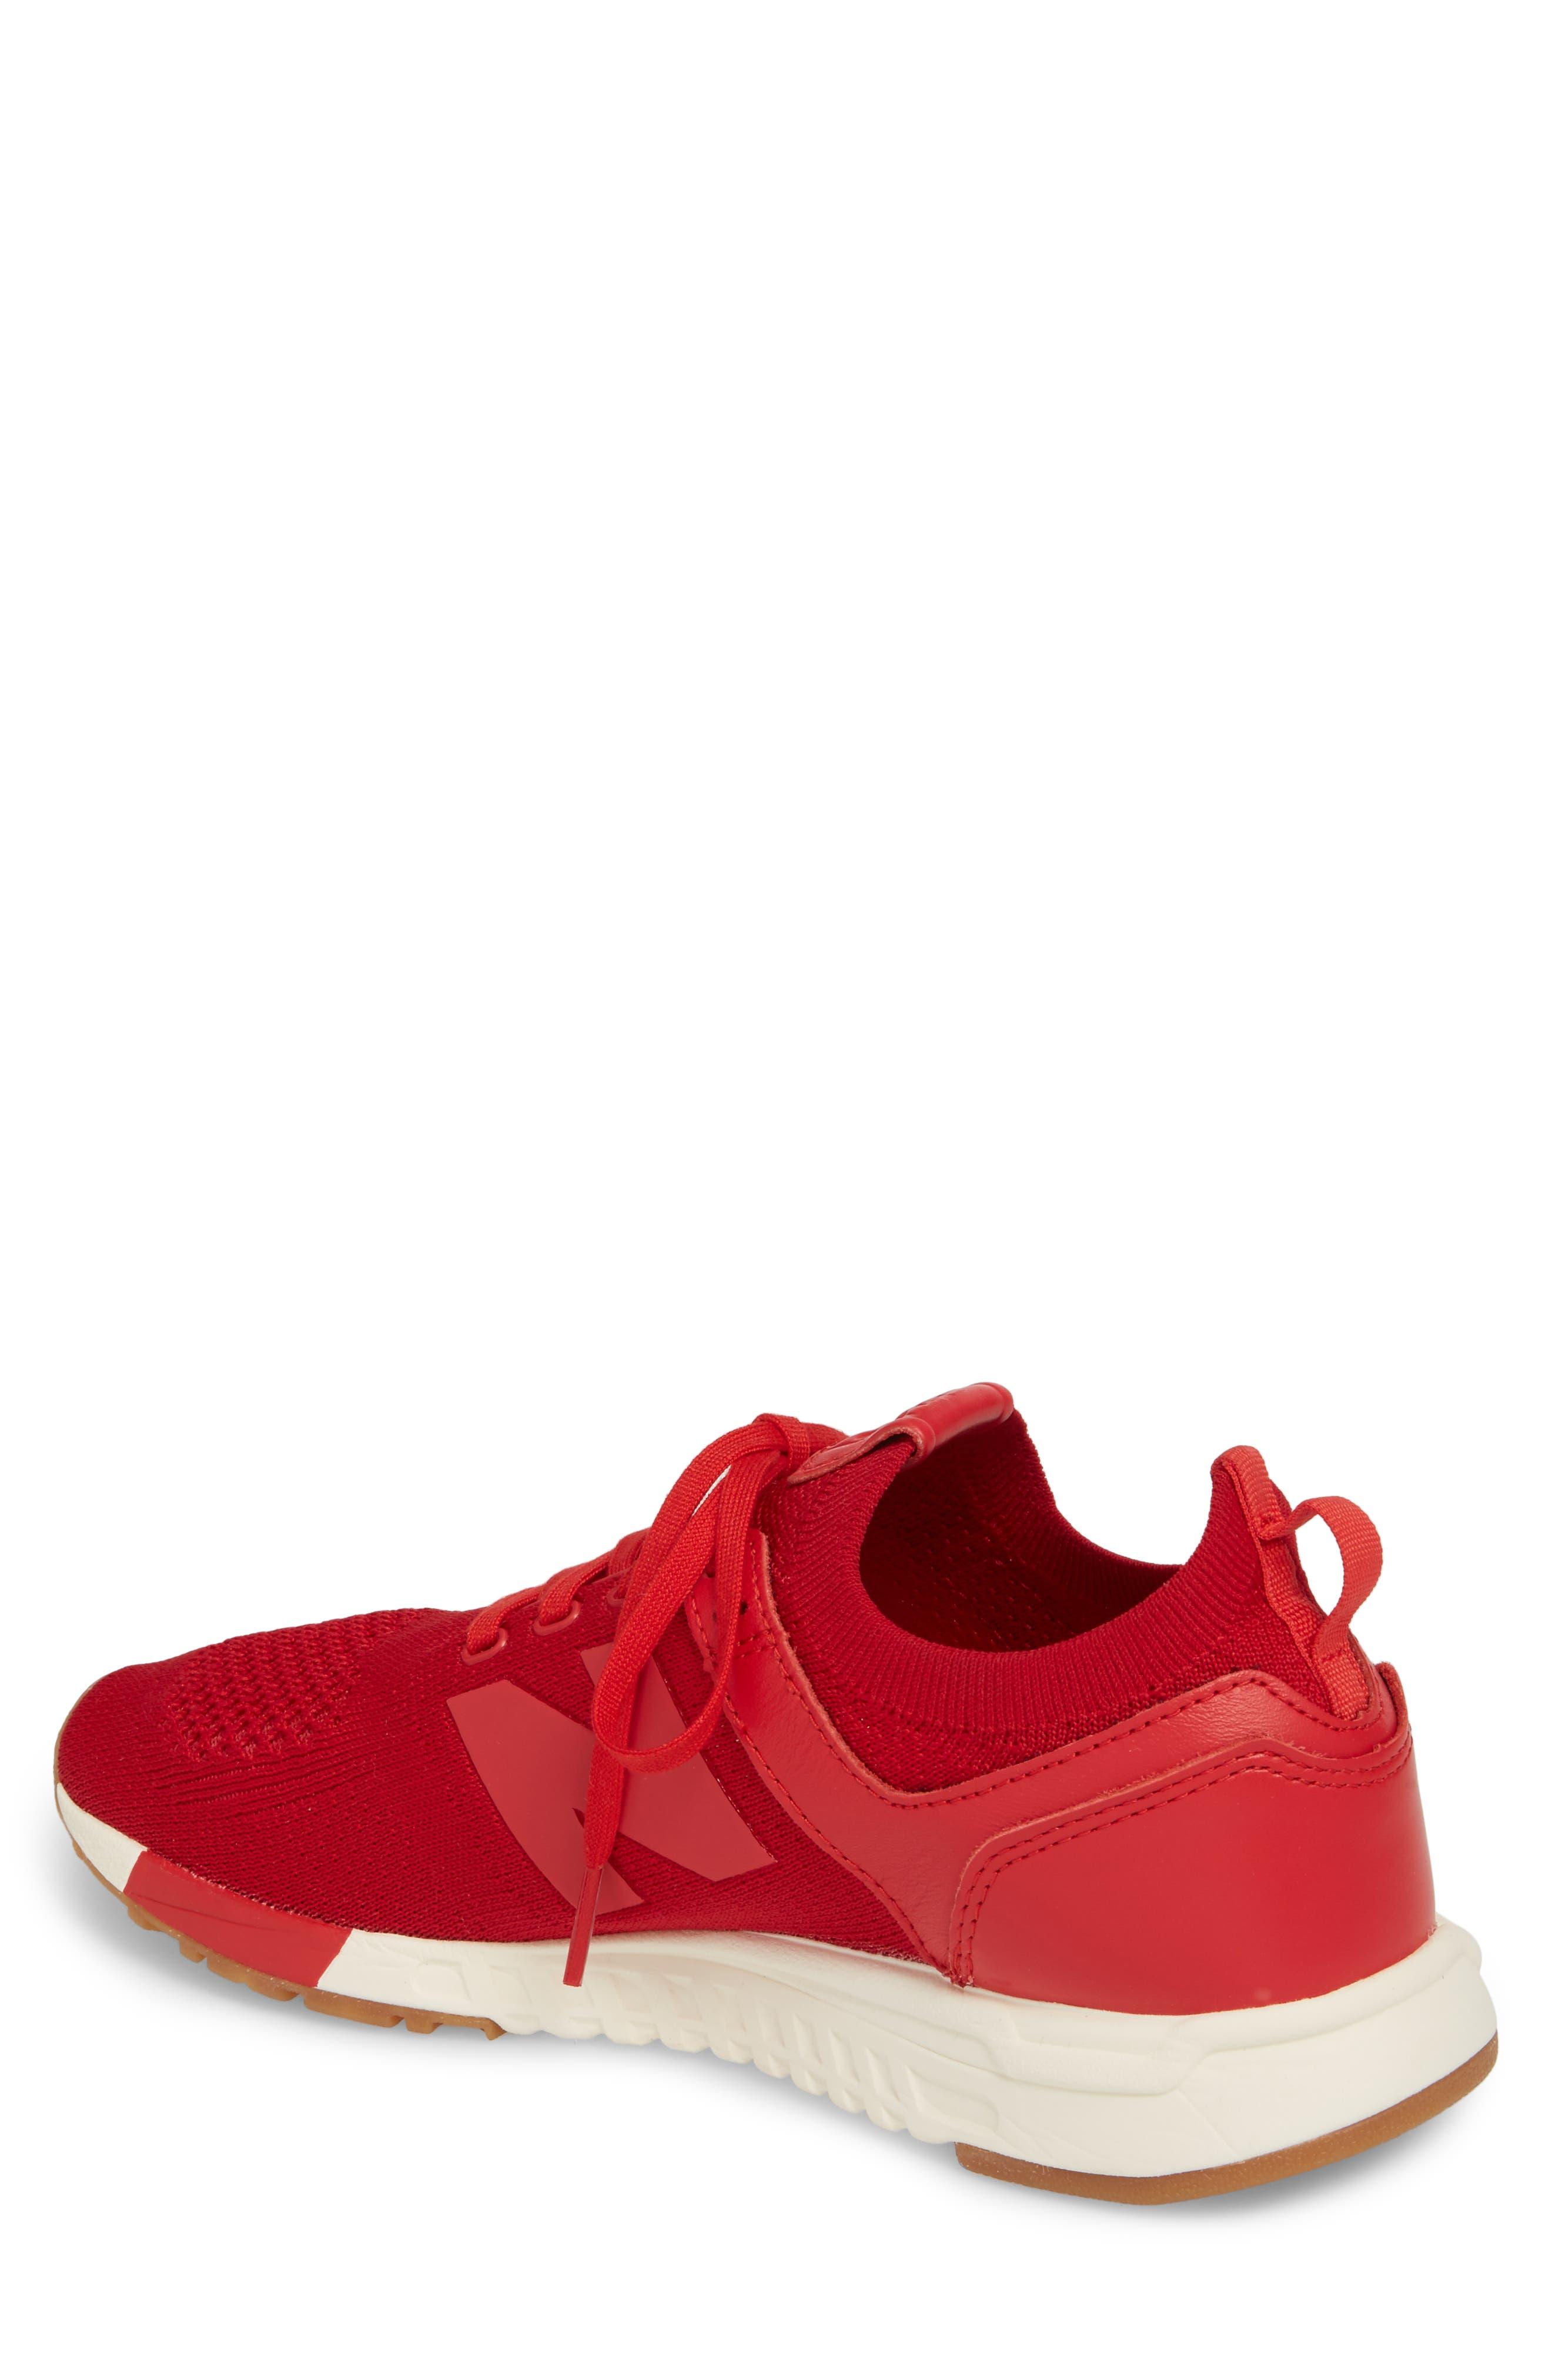 247 Decon Knit Sneaker,                             Alternate thumbnail 10, color,